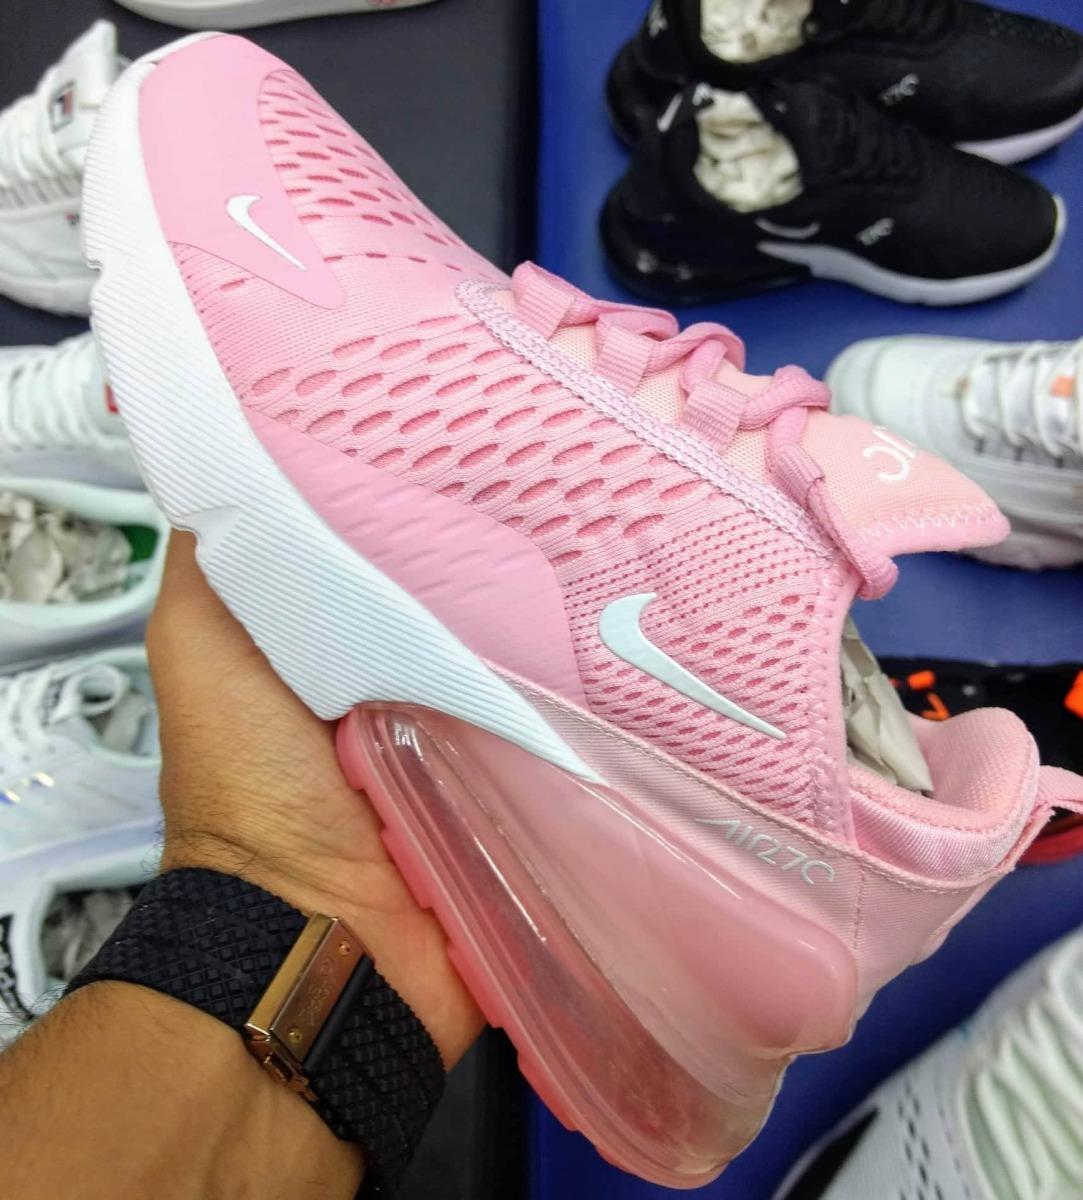 lo último 488e7 3157a Tenis Nike Air Max 270 Mujer